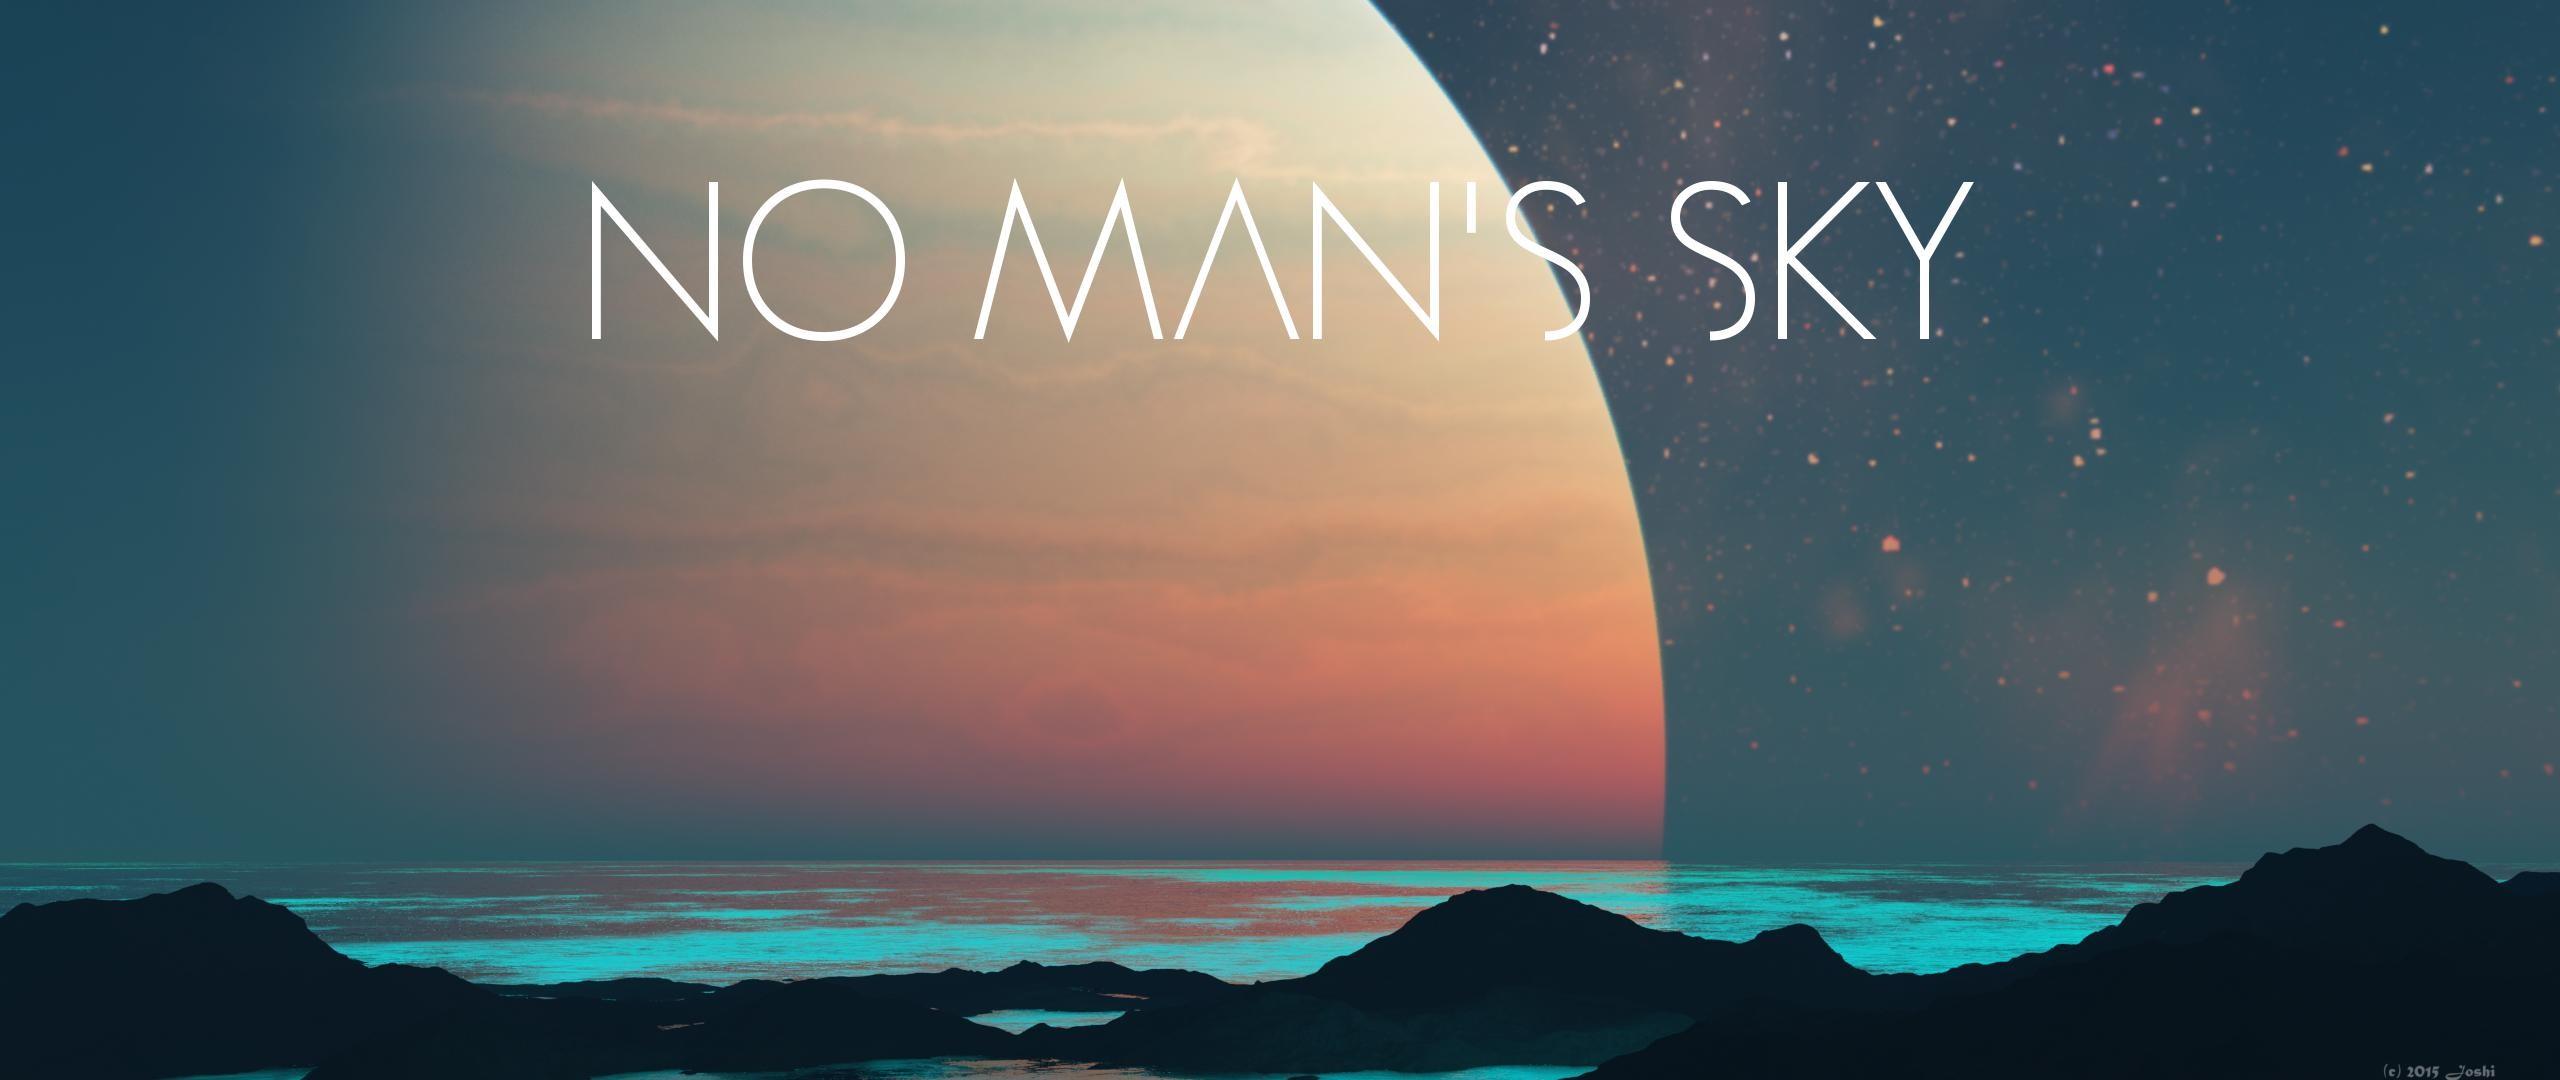 No Mans Sky Wallpaper 4k 82 Images